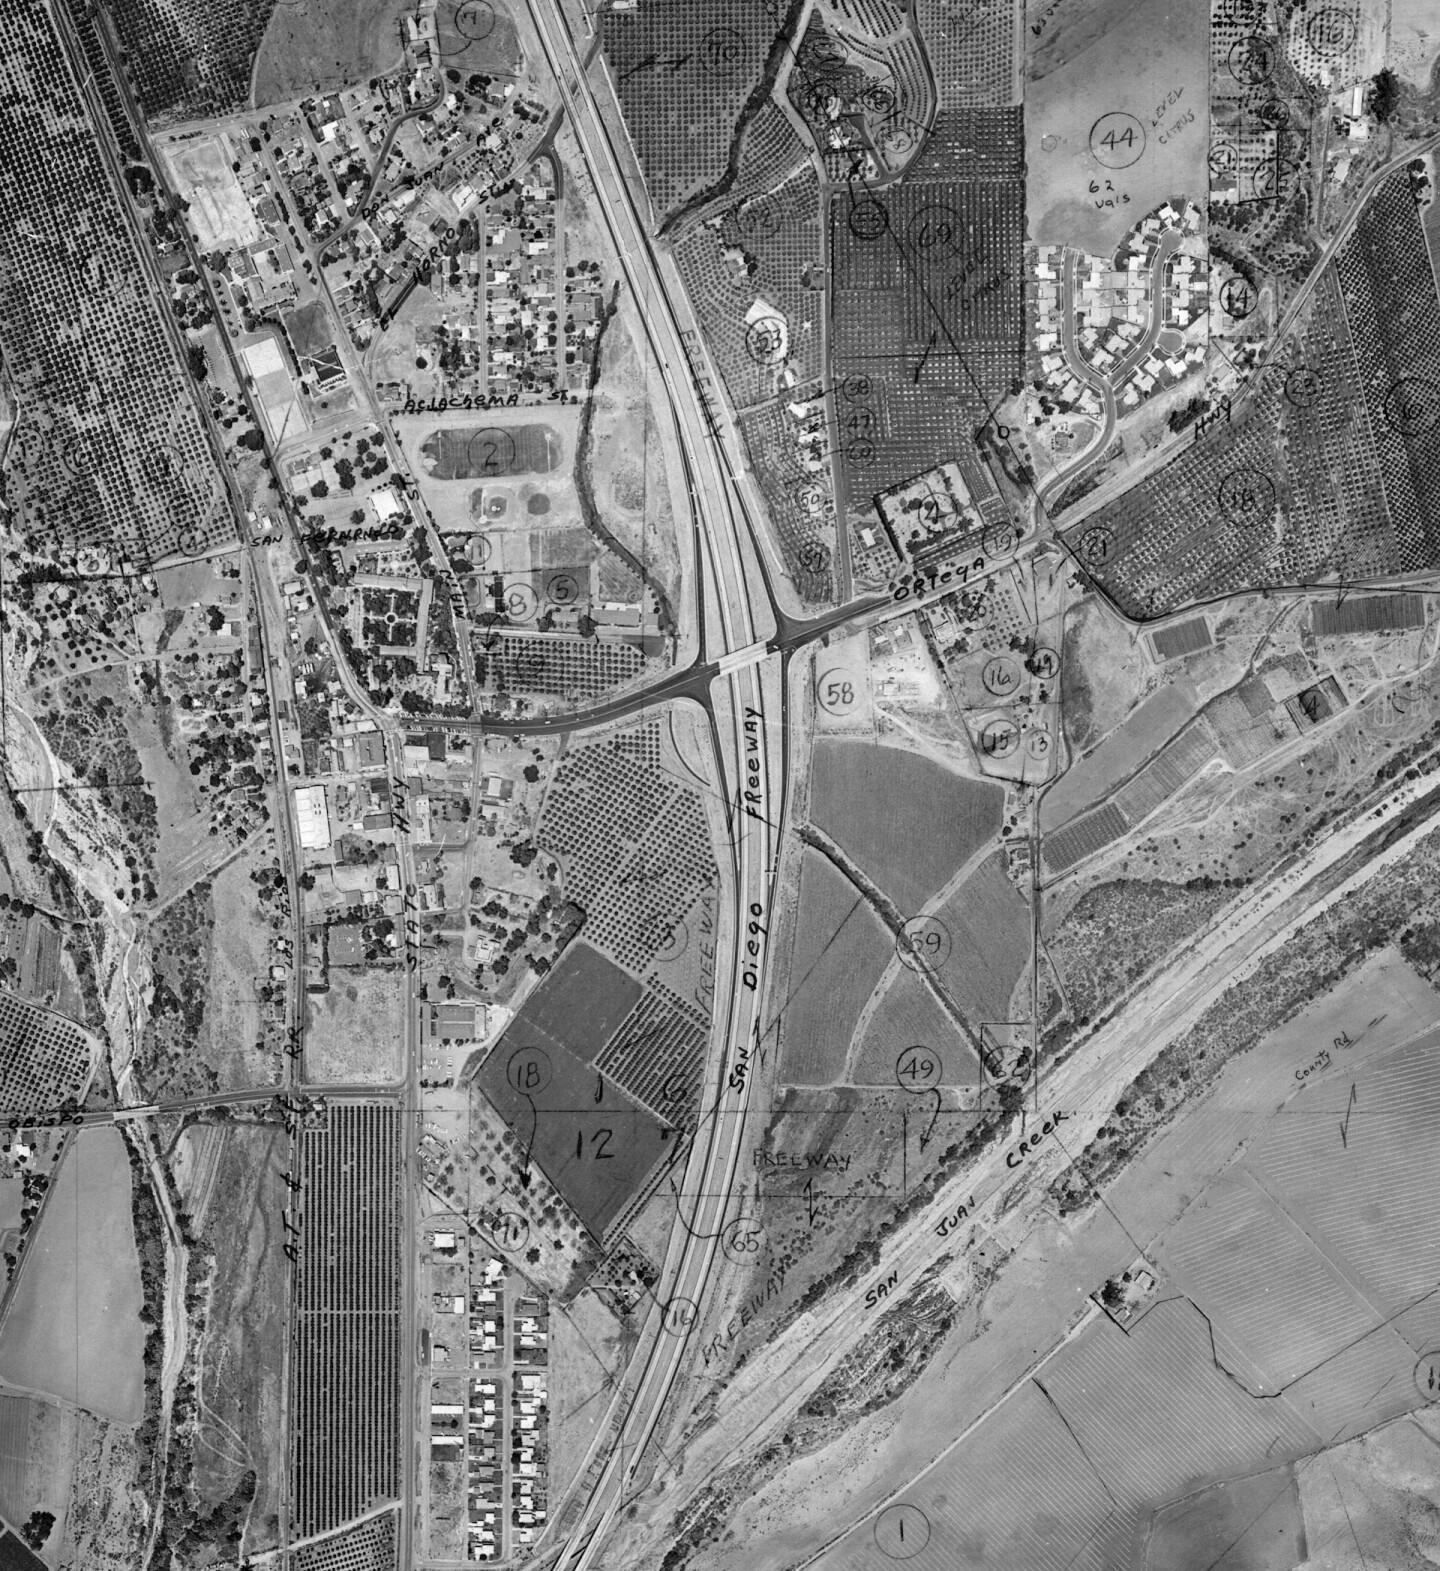 Aerial shot of the San Diego Freeway (I-5) through San Juan Capistrano